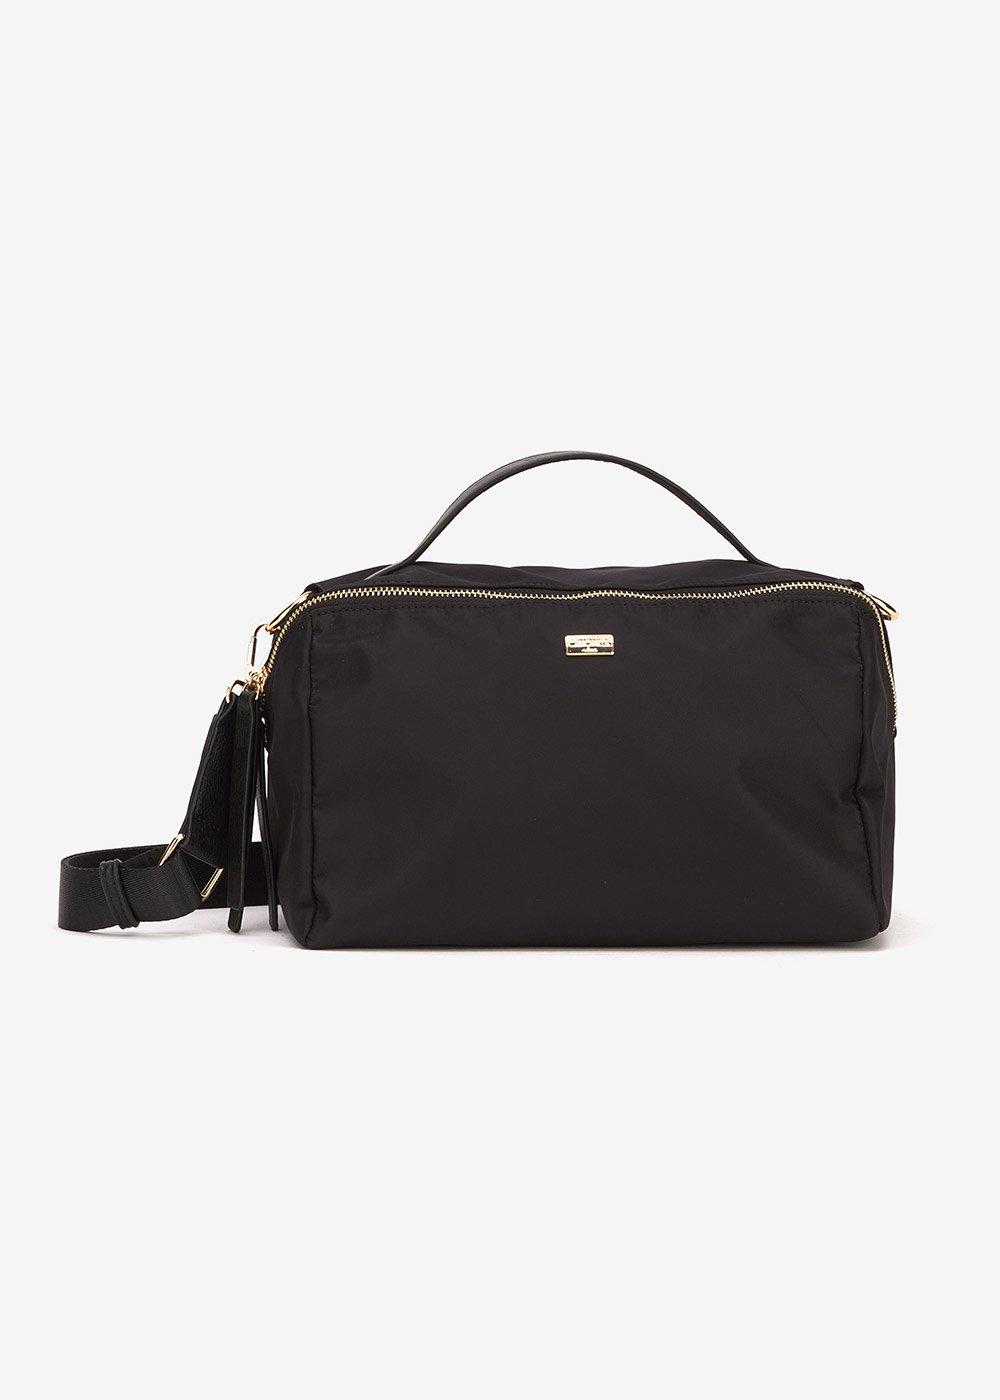 Blanc Boston bag in technical fabric - Black - Woman